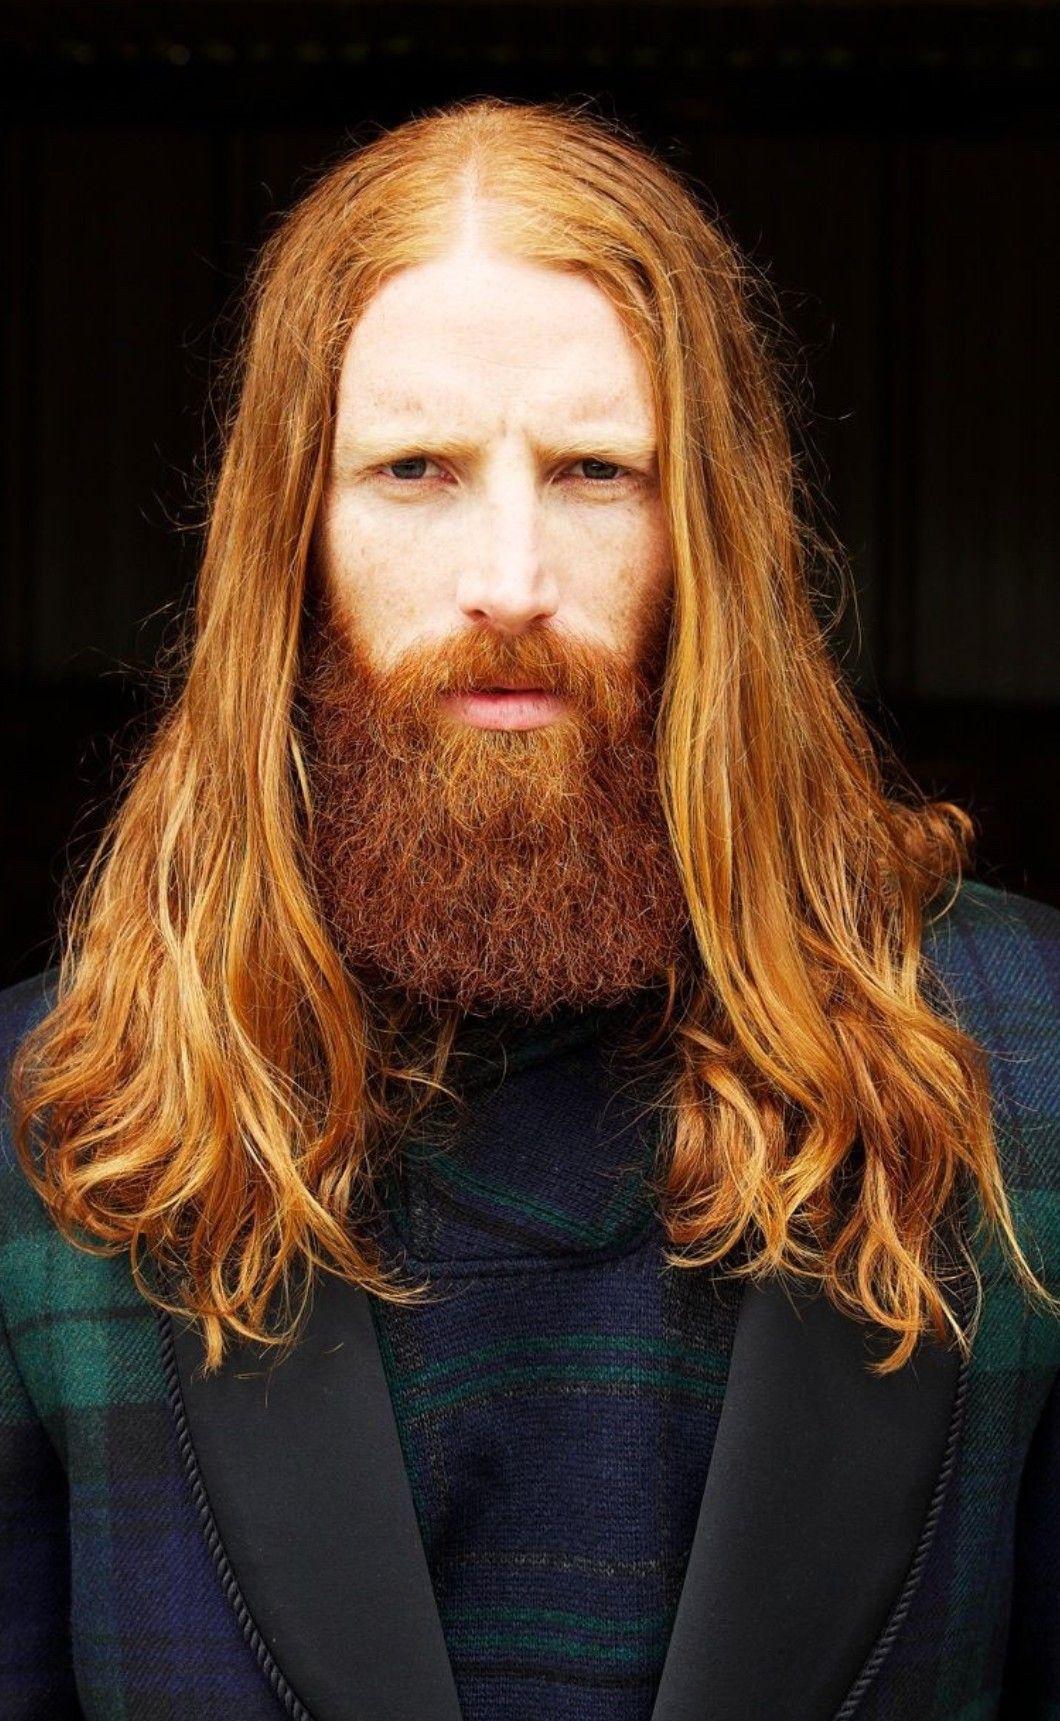 Redhead men with long hair